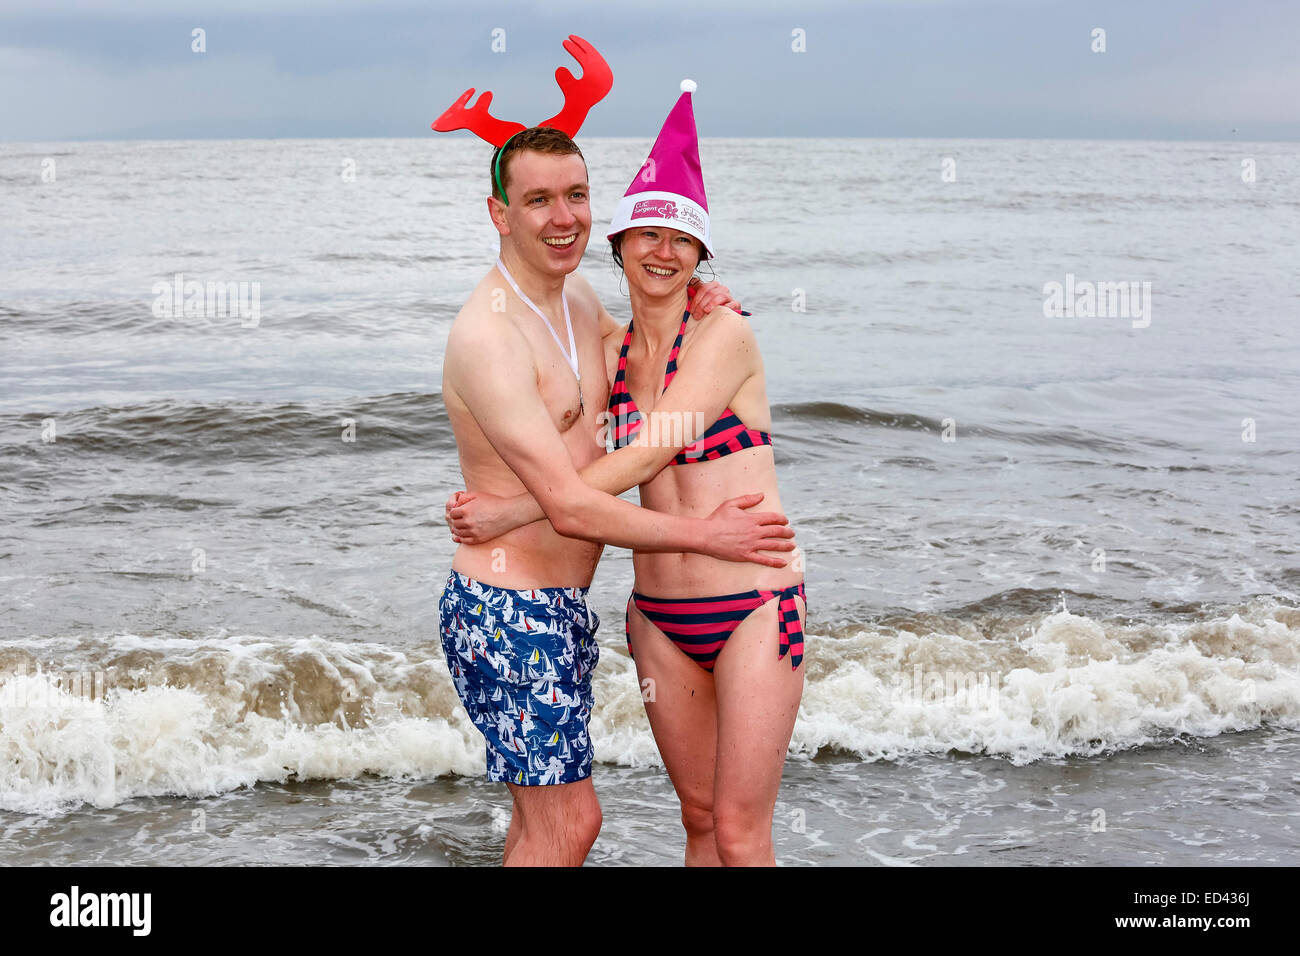 Prestwick, Scotland, UK. 26th Dec, 2014. The 9th annual clic sergent Boxing Day swim was held at Prestwick beach, - Stock Image